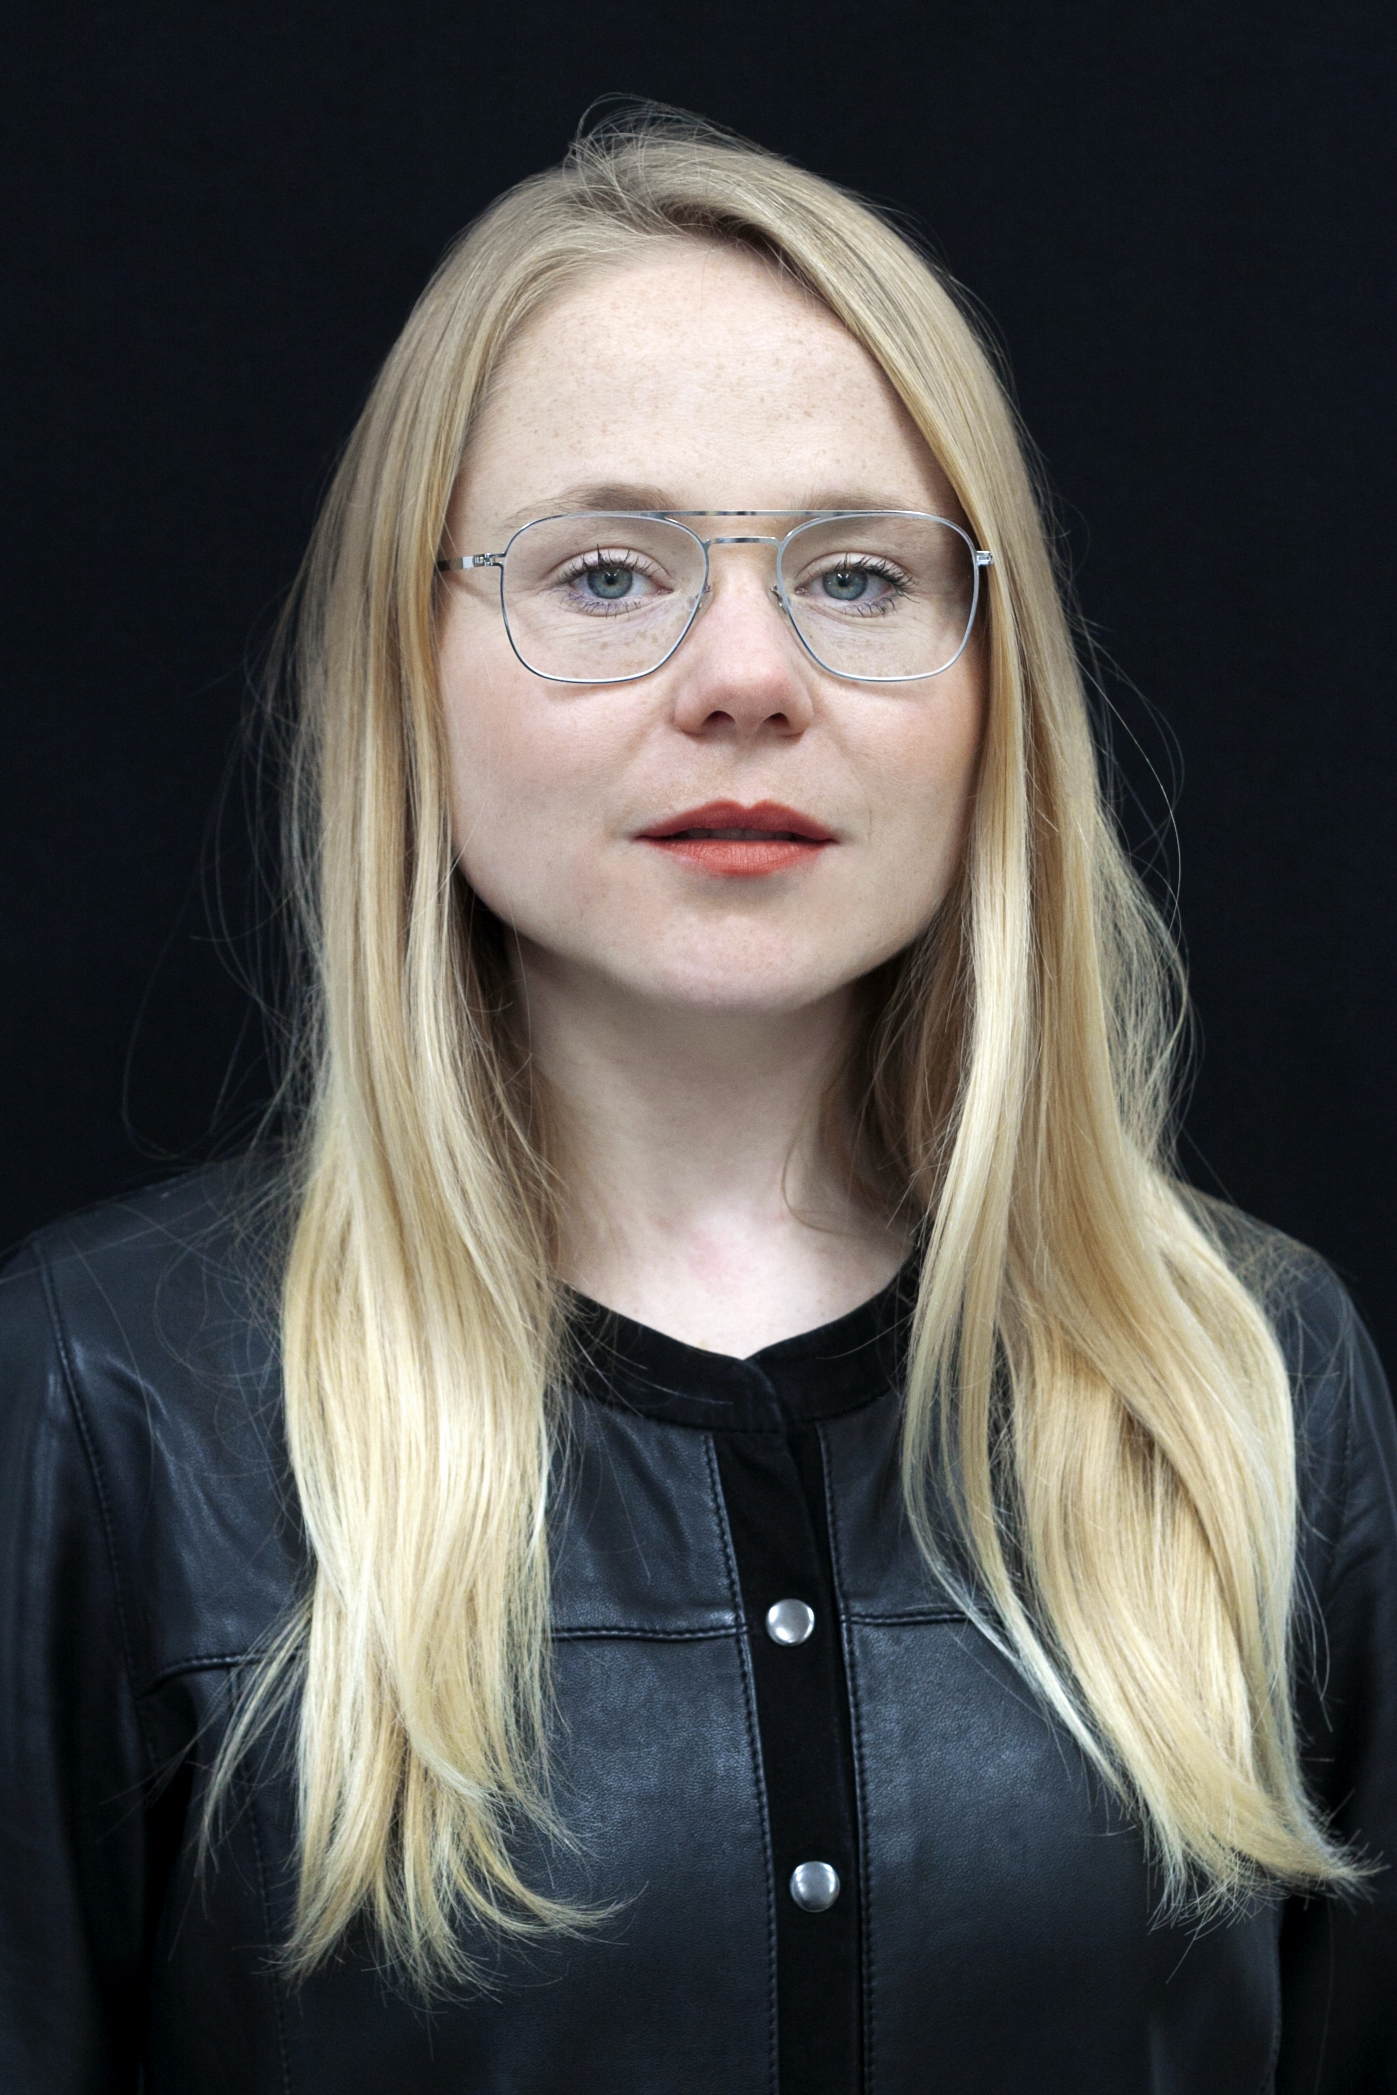 Andrea Karch, Photo by Rutger de Vries